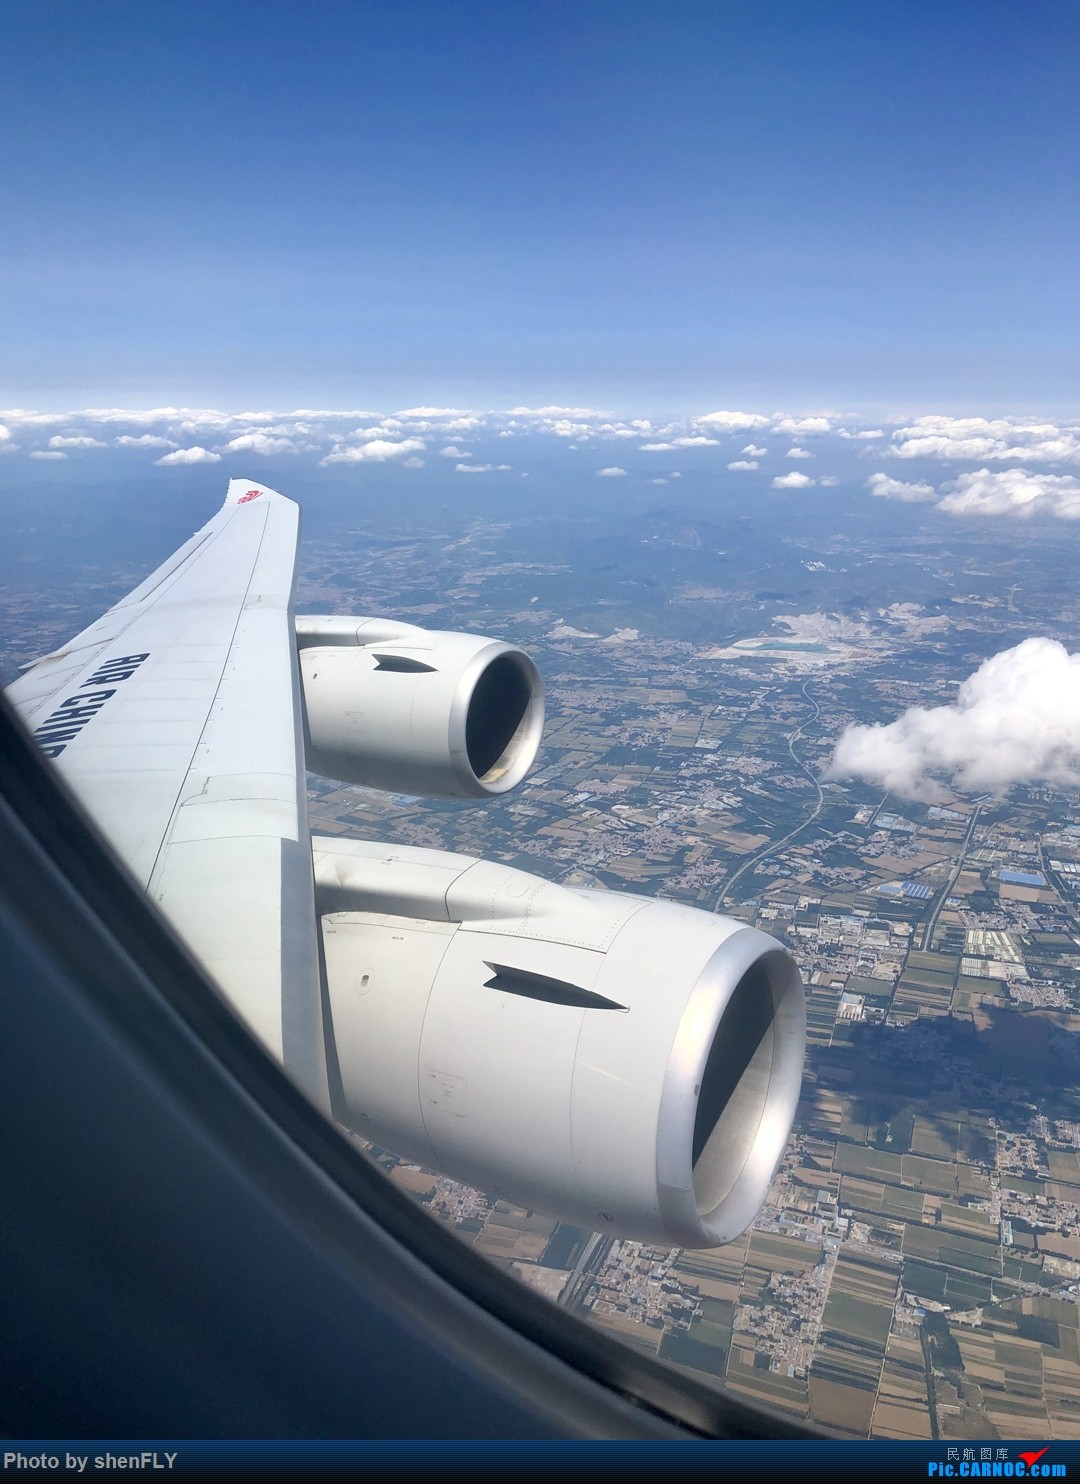 Re:[原创]【京沪快线四发之旅】国航B747-8I 超经+上层公务往返之旅 BOEING 747-8I B-2486 空中